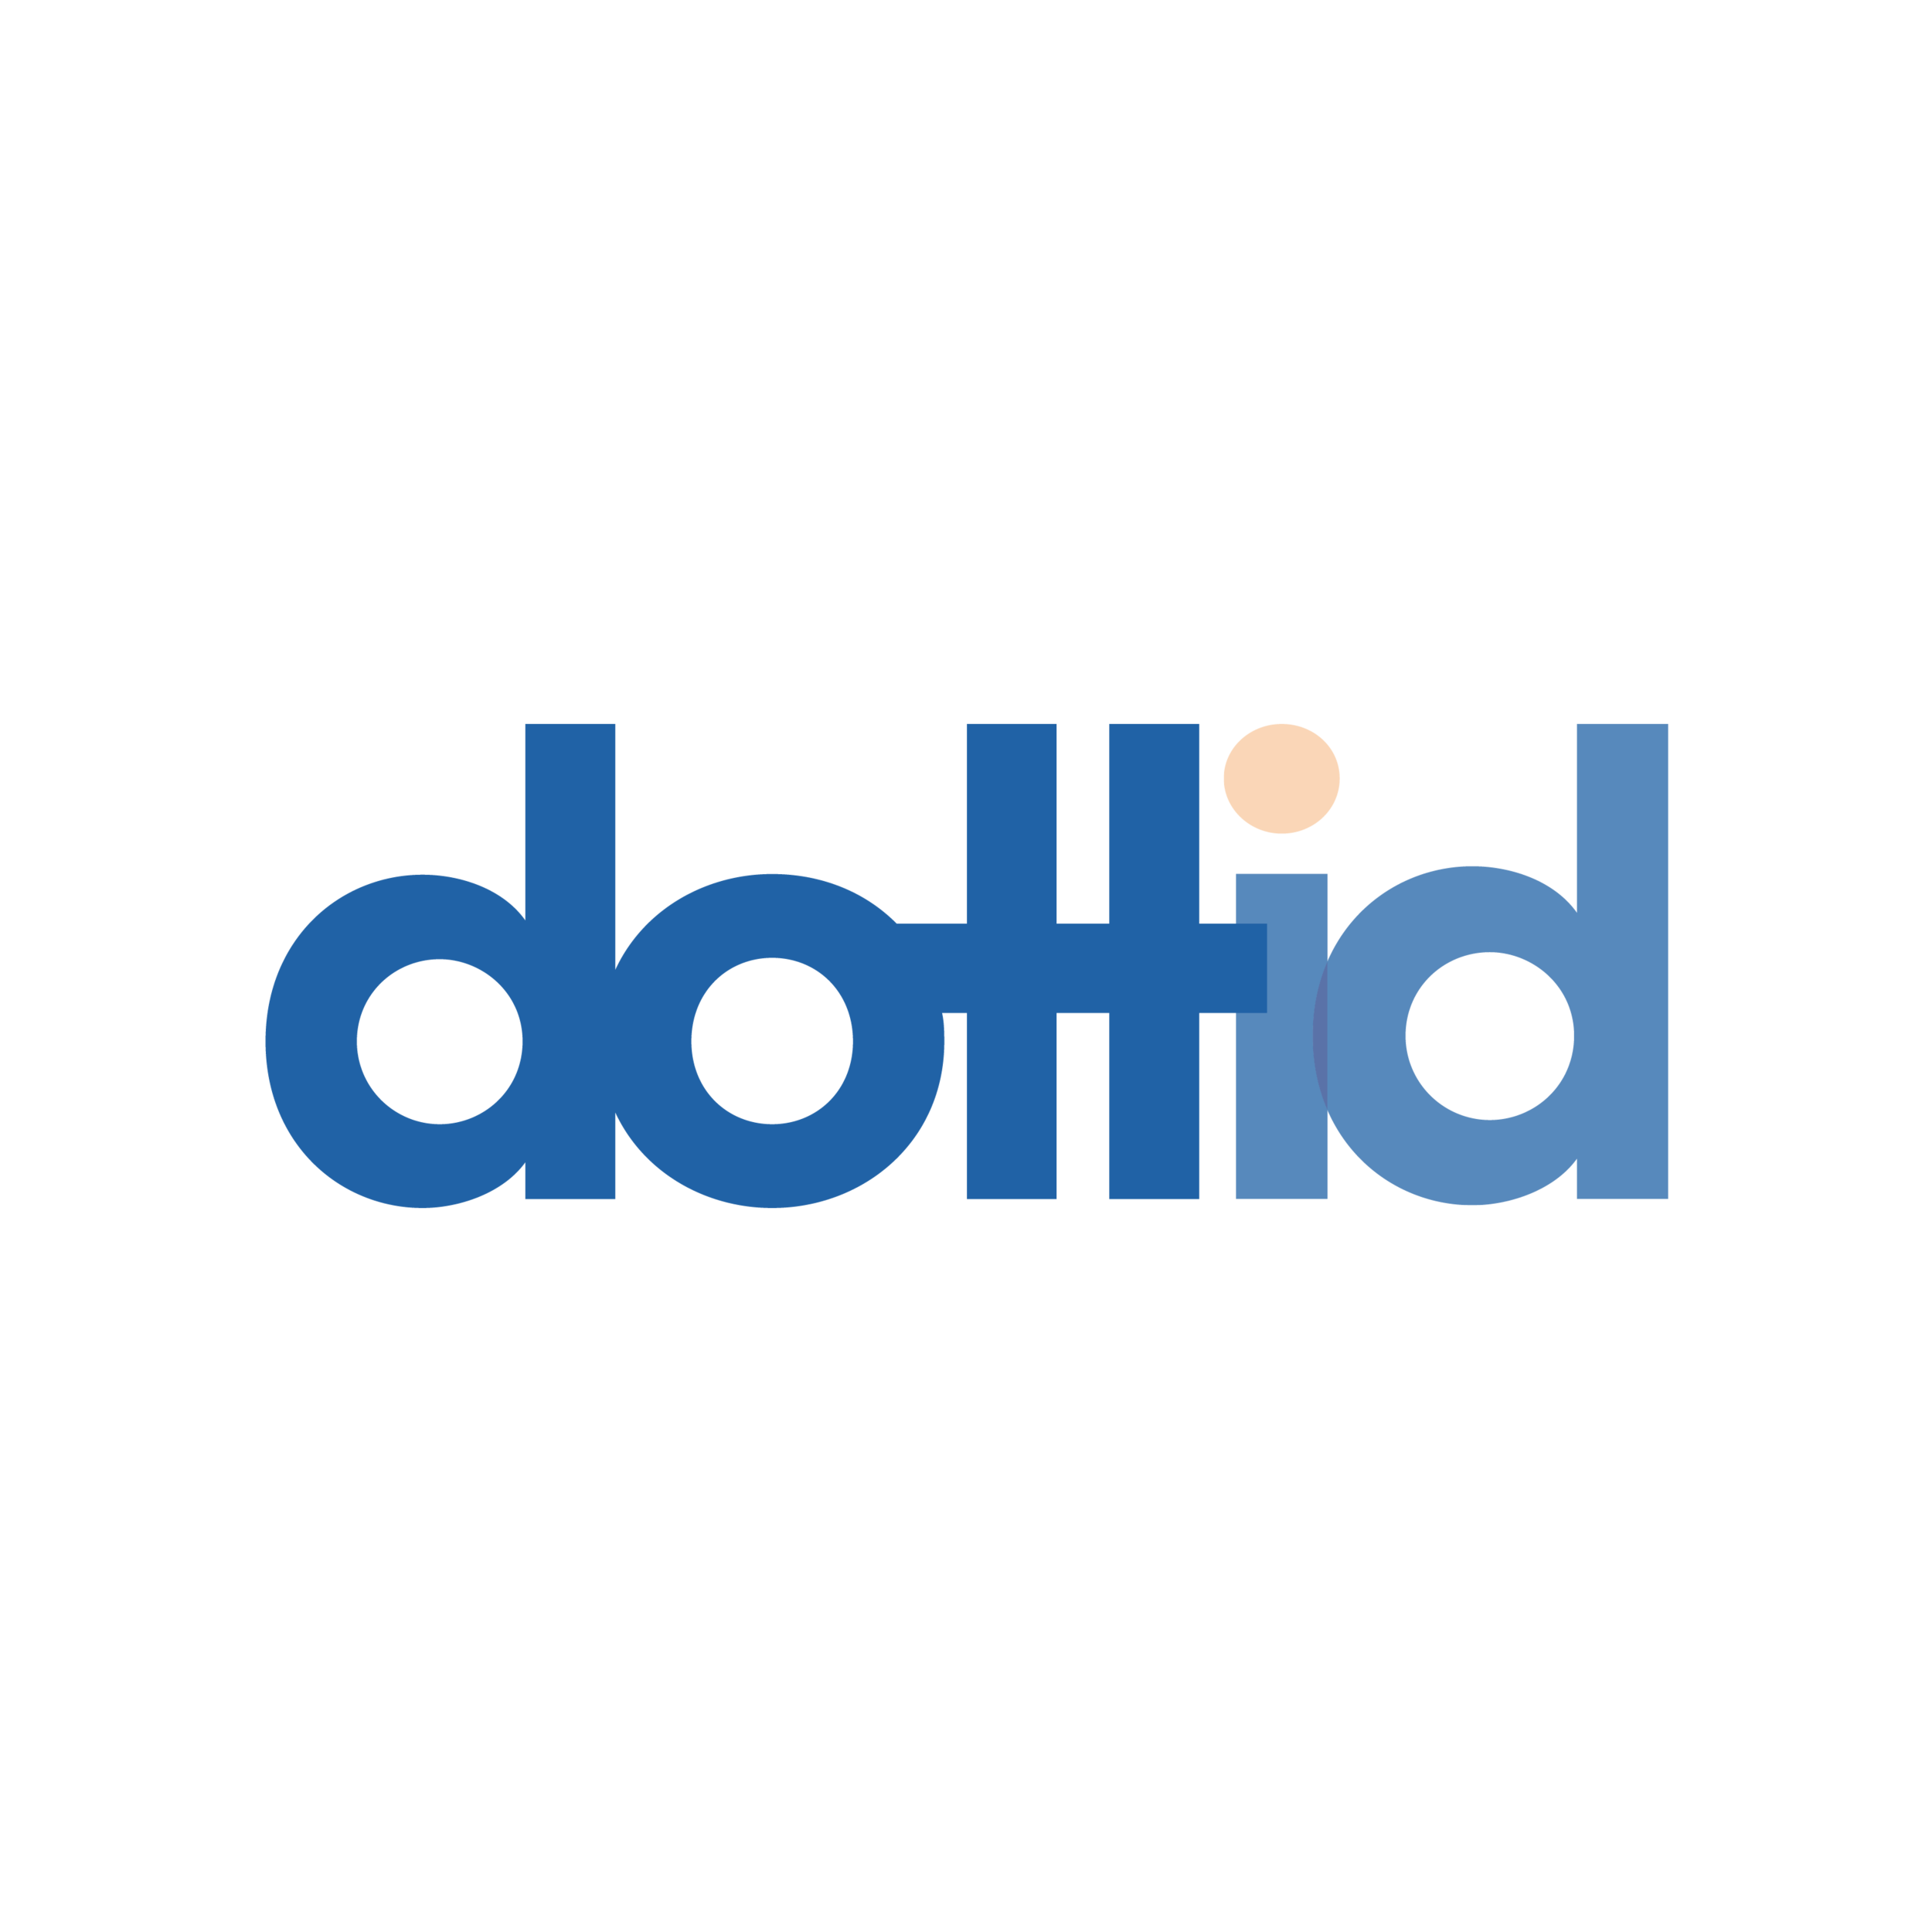 dottid-01.png